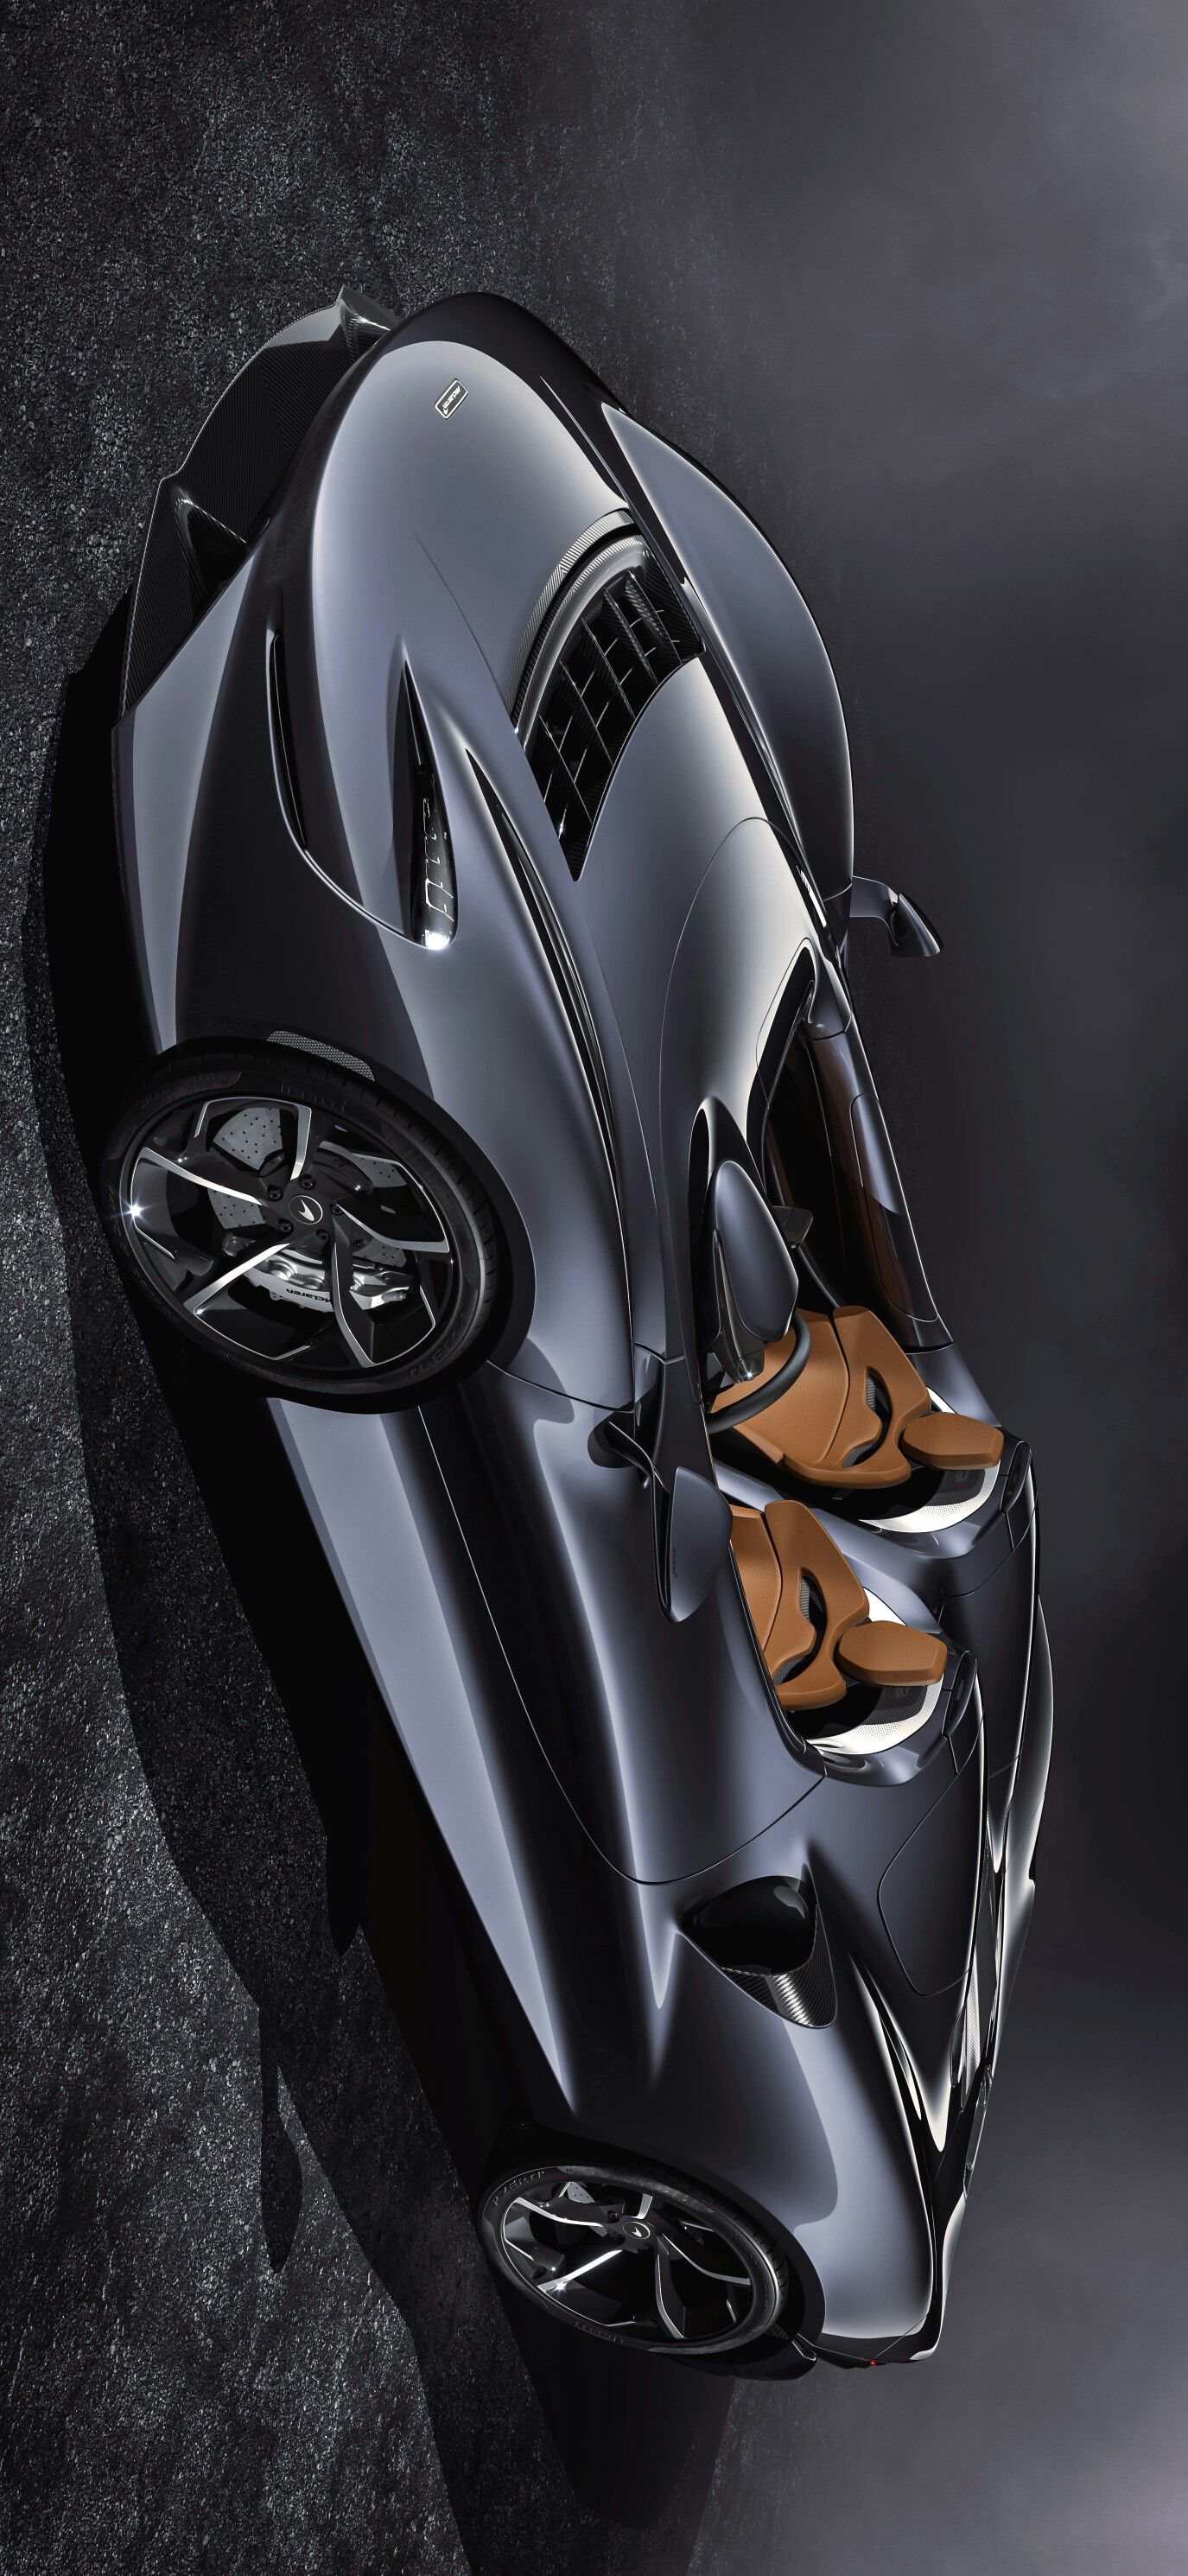 2021 Mclaren Elva Image Enhancements By Keely Vonmonski Super Cars Koenigsegg Mclaren